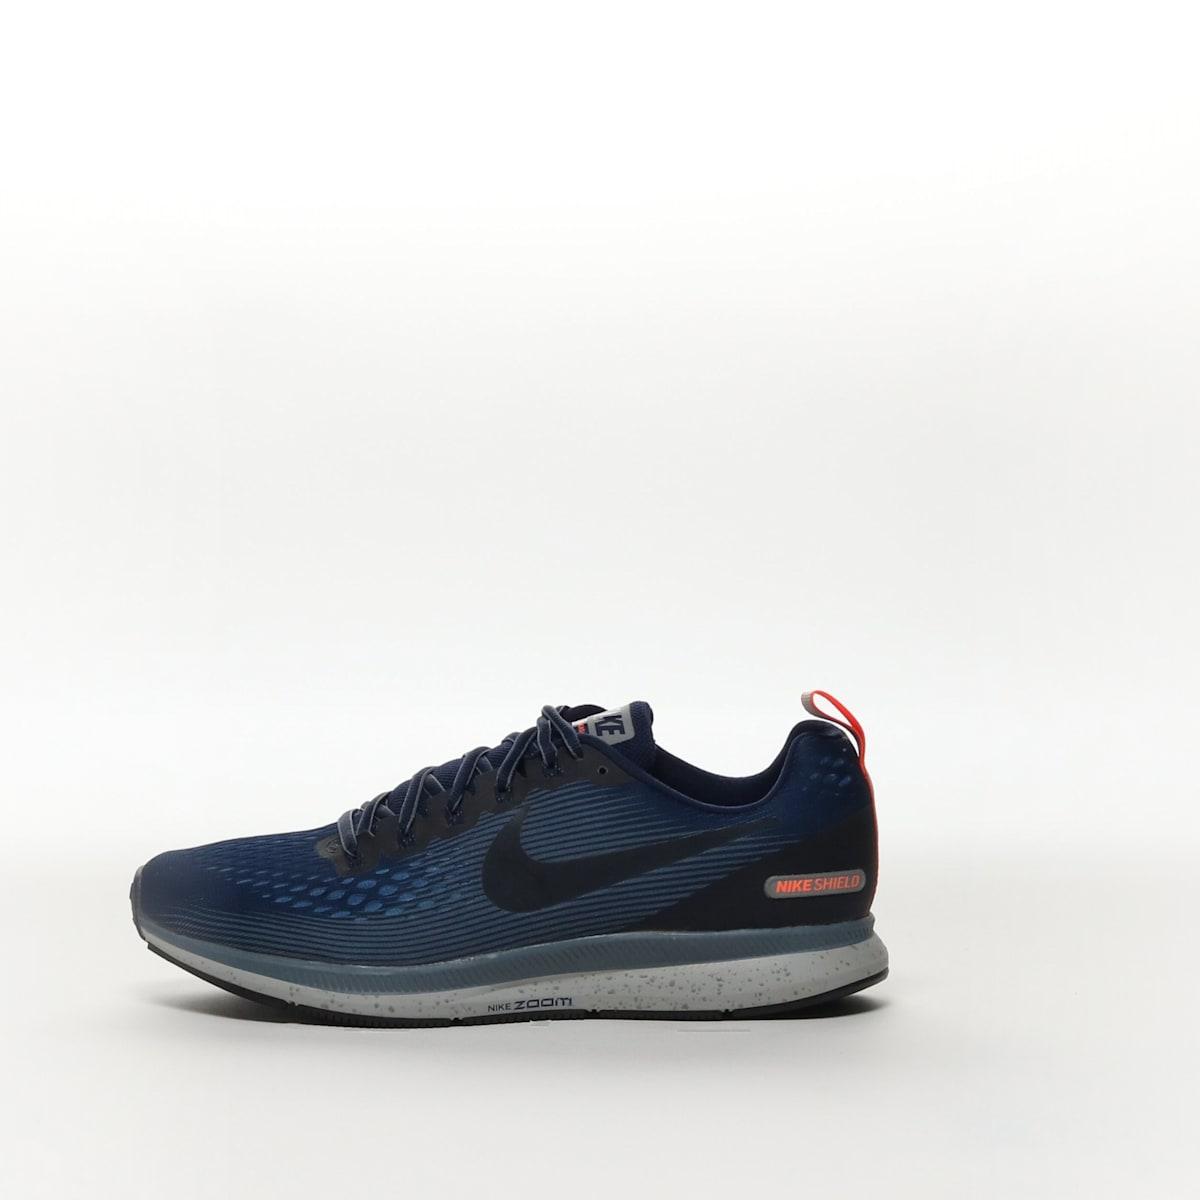 cd04d2897d2 Nike Air Zoom Pegasus 34 Shield - BINARY BLUE ARMORY BLUE OBSIDIAN ...